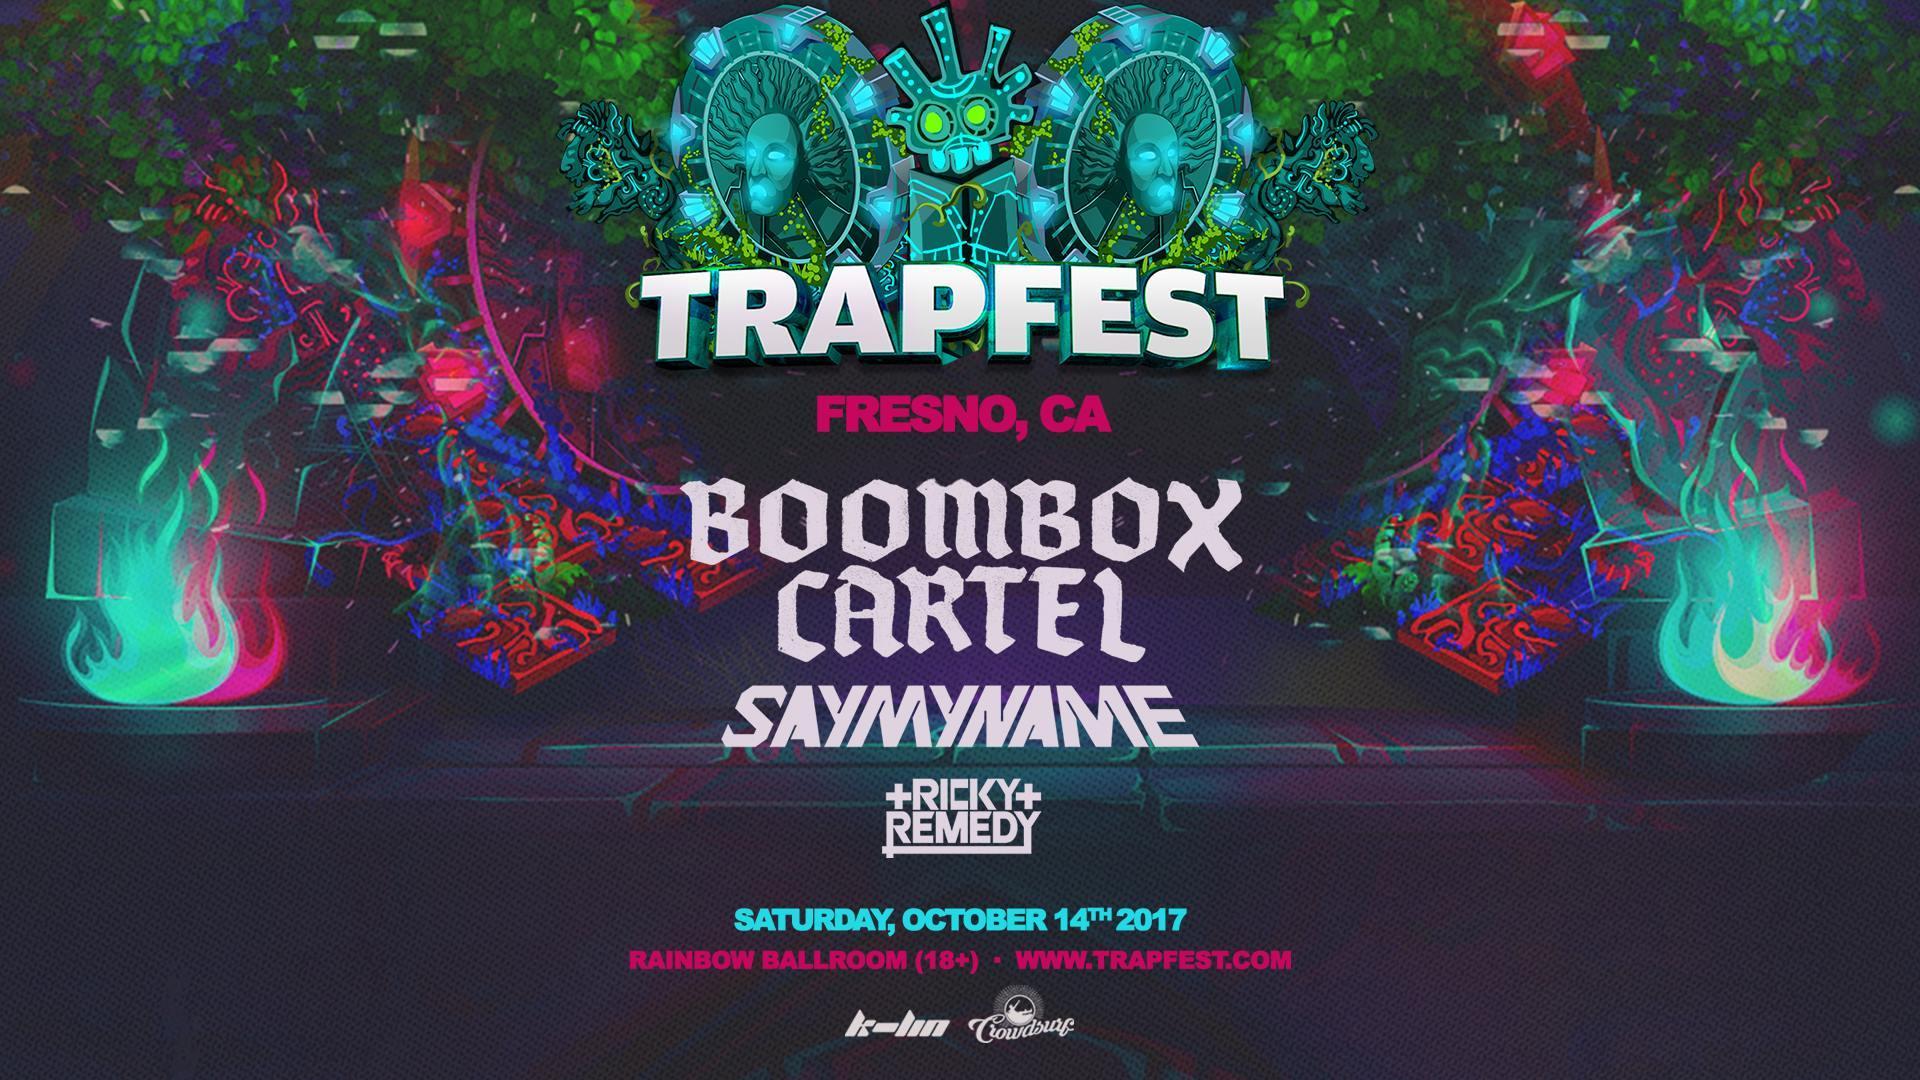 Trapfest 2017 (Fresno, CA)